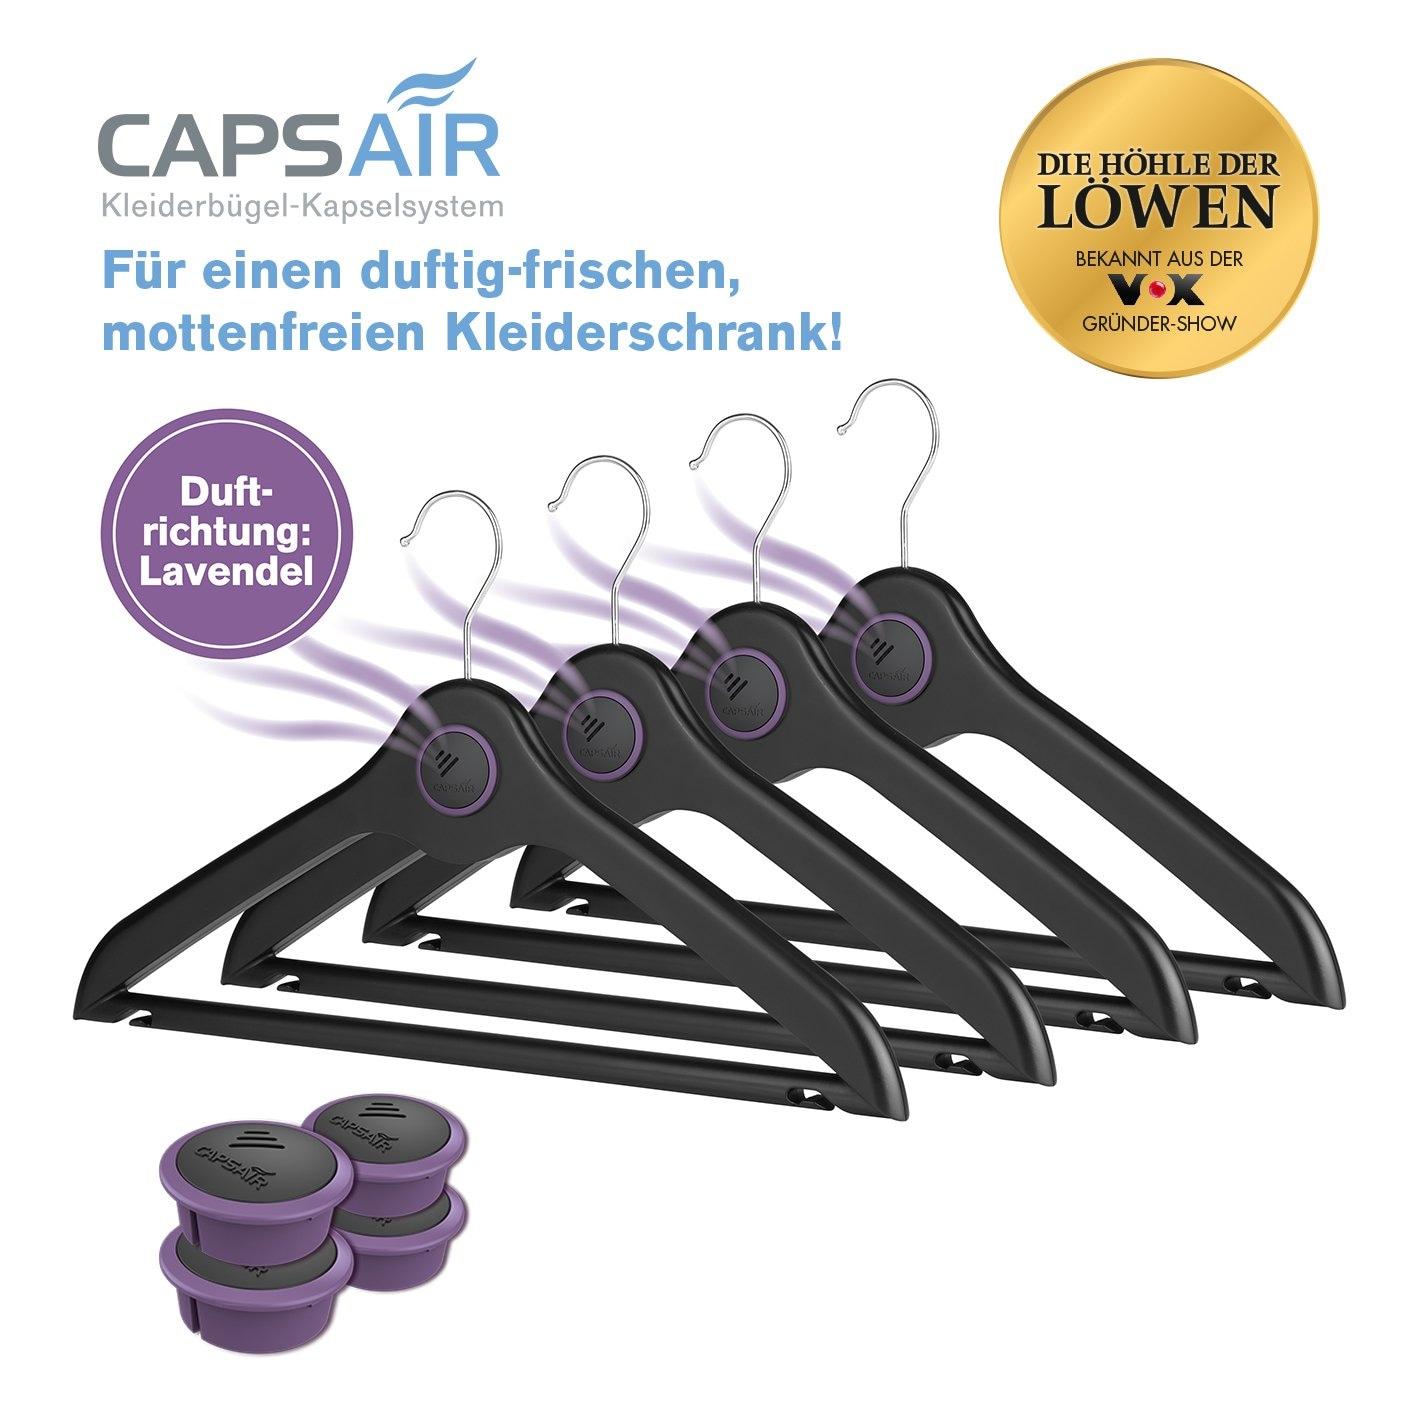 Caps Air Bügel 4er-Set schwarz mit 4 Kapseln Lavendel